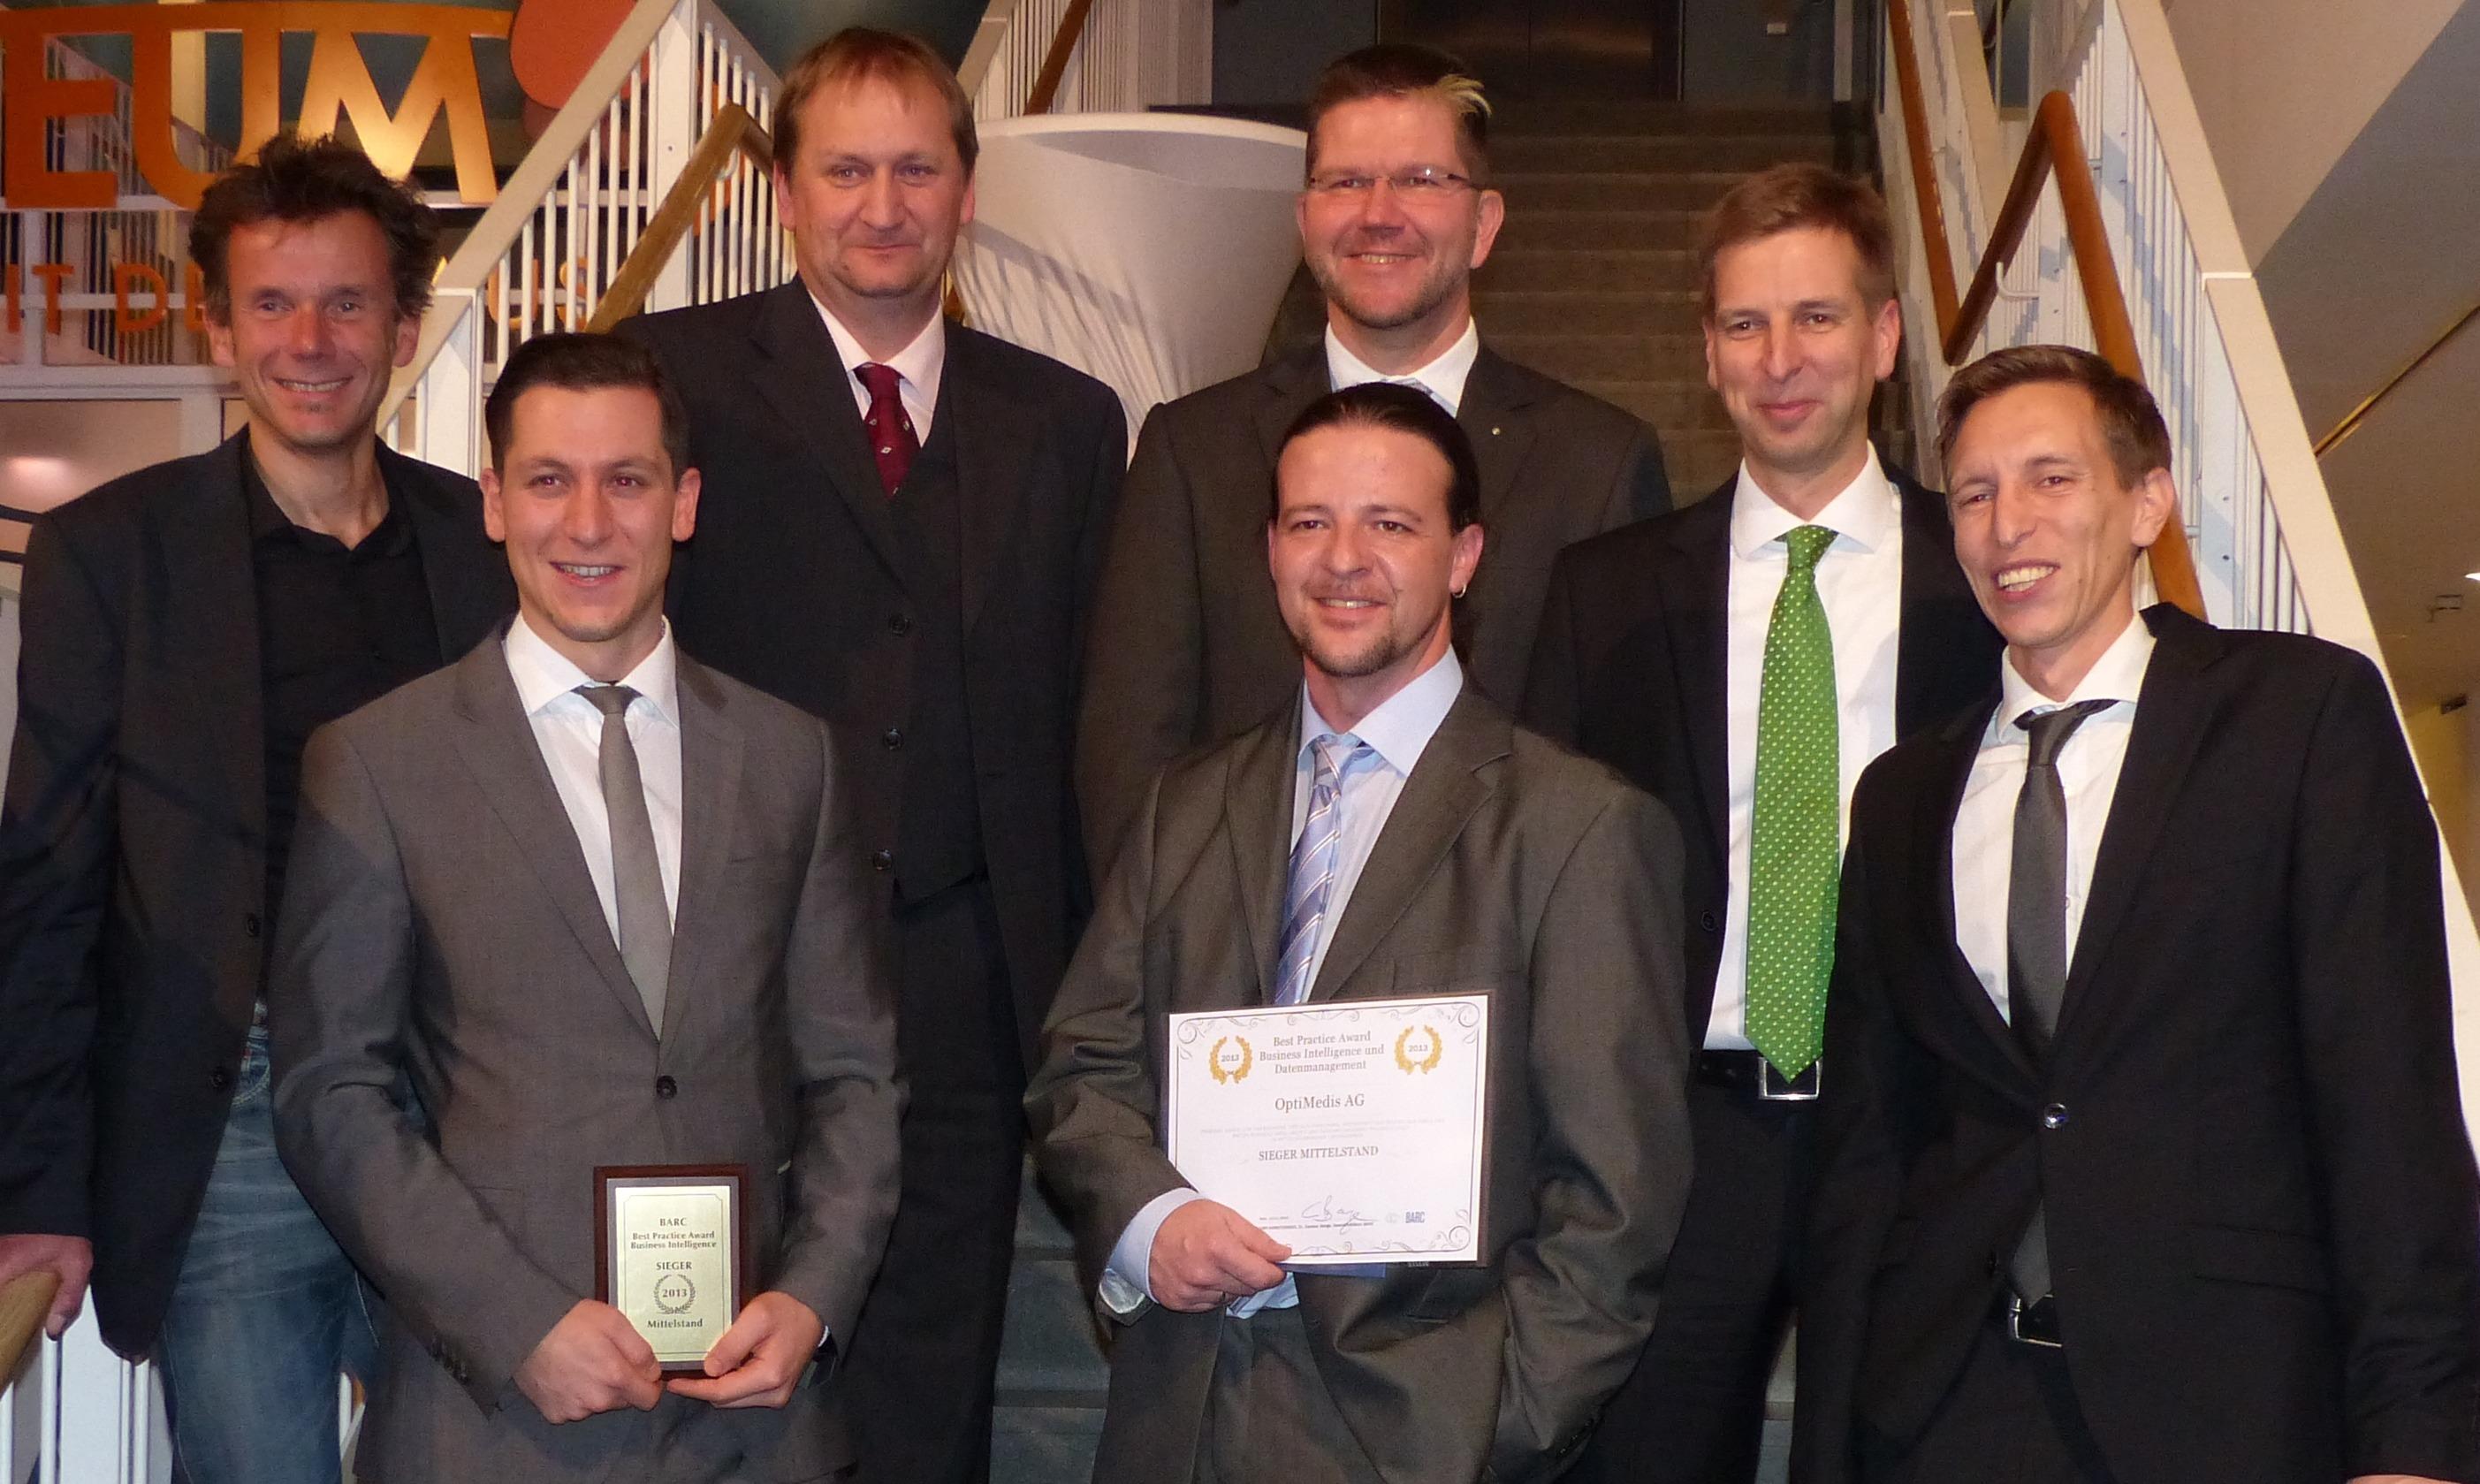 BARC Best Practise Award BI 2013 - Sieger: Gruppenbild OptiMedis und BARC